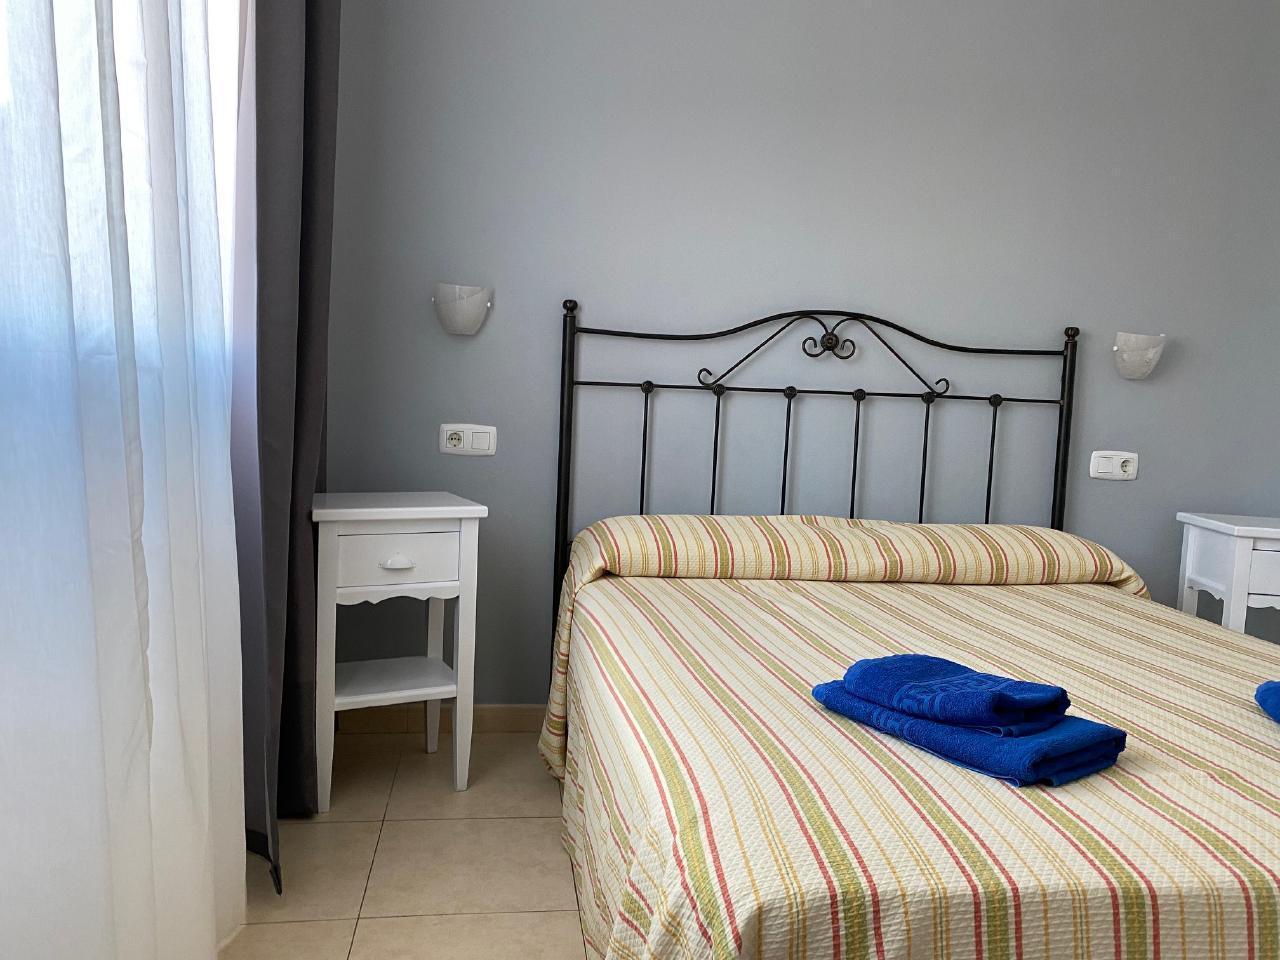 Ferienwohnung Apartments RO Corralejo (II) (431498), Corralejo, Fuerteventura, Kanarische Inseln, Spanien, Bild 25